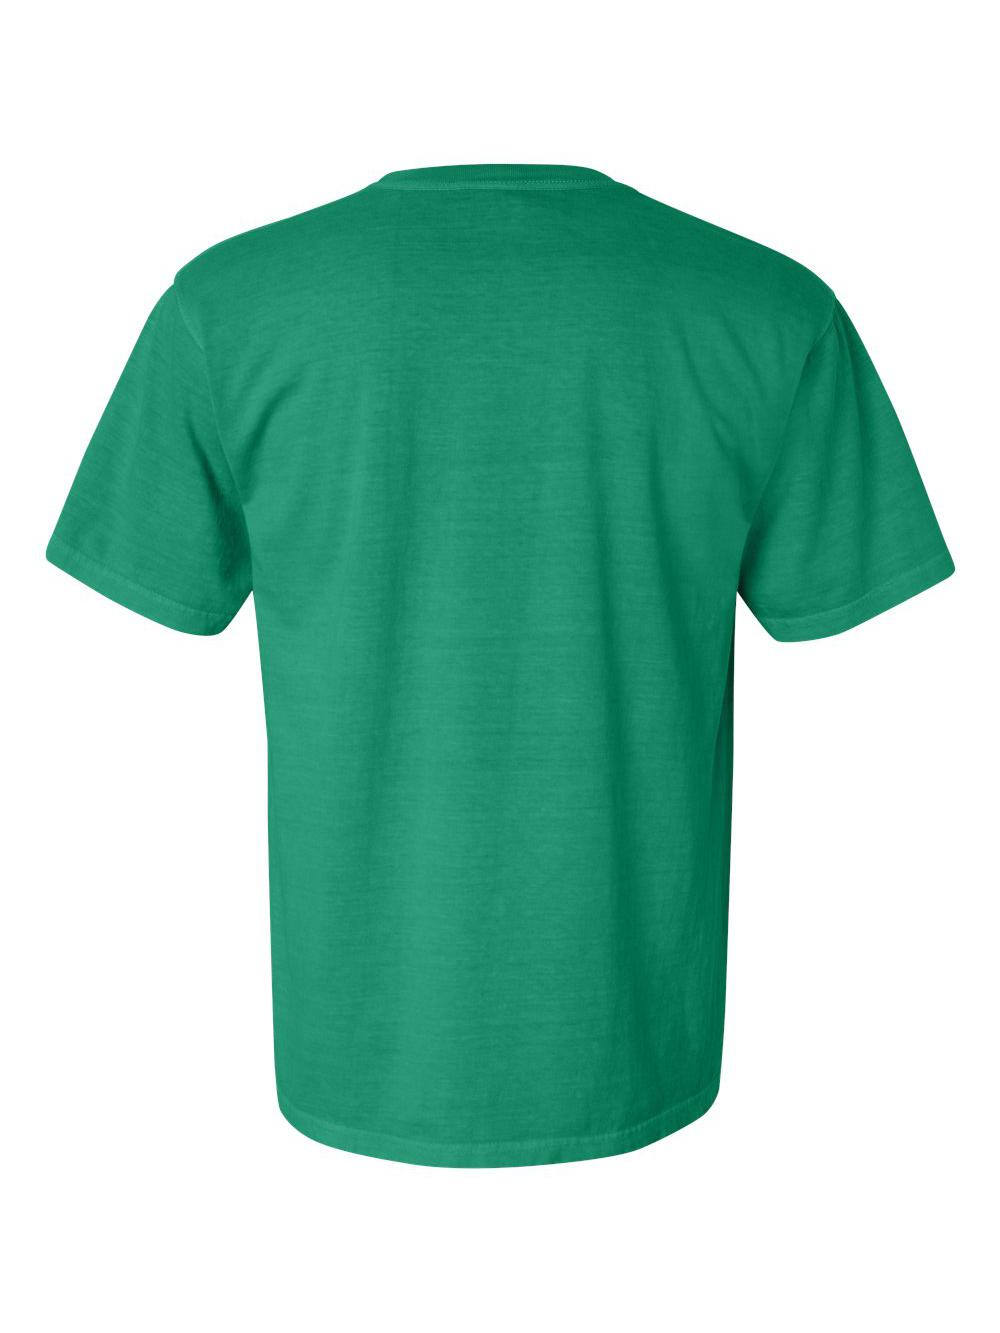 Comfort-Colors-Garment-Dyed-Heavyweight-Ringspun-Short-Sleeve-Shirt-1717 thumbnail 58